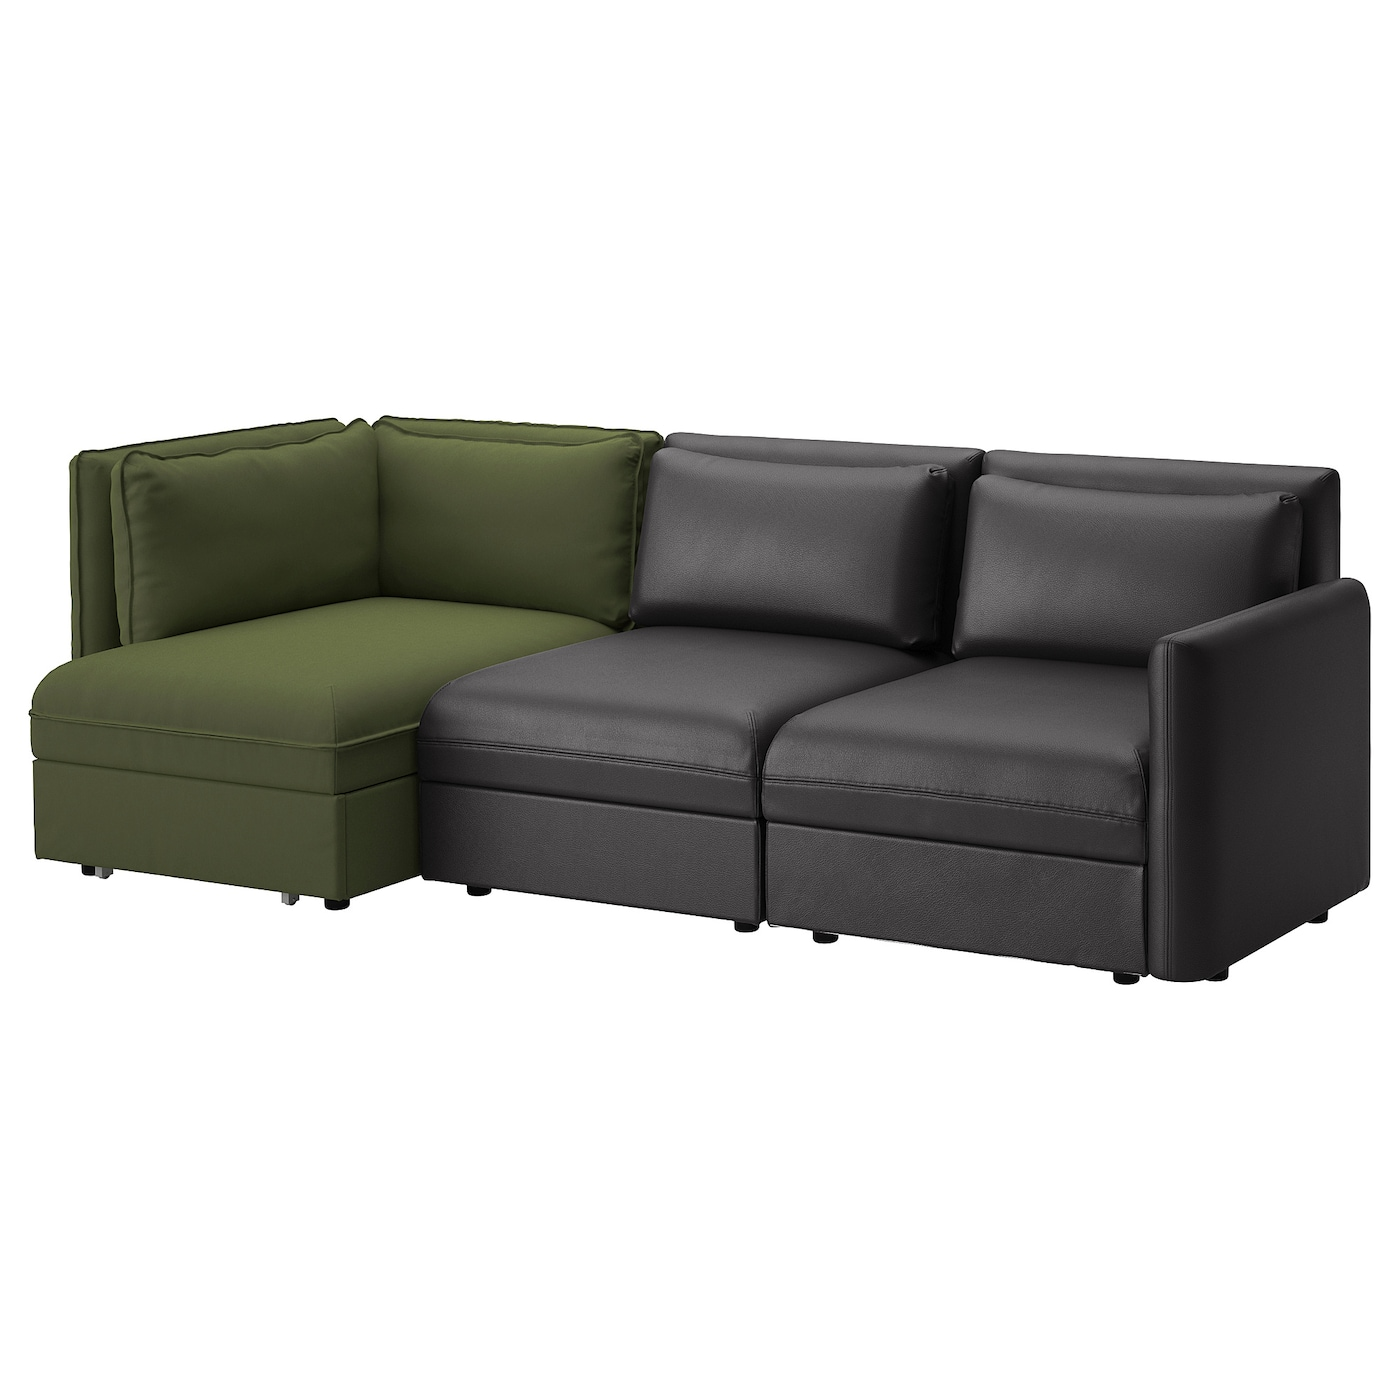 Leather sofa bed Sectional Vallentuna Ikea Sofa Beds Ikea Ireland Dublin